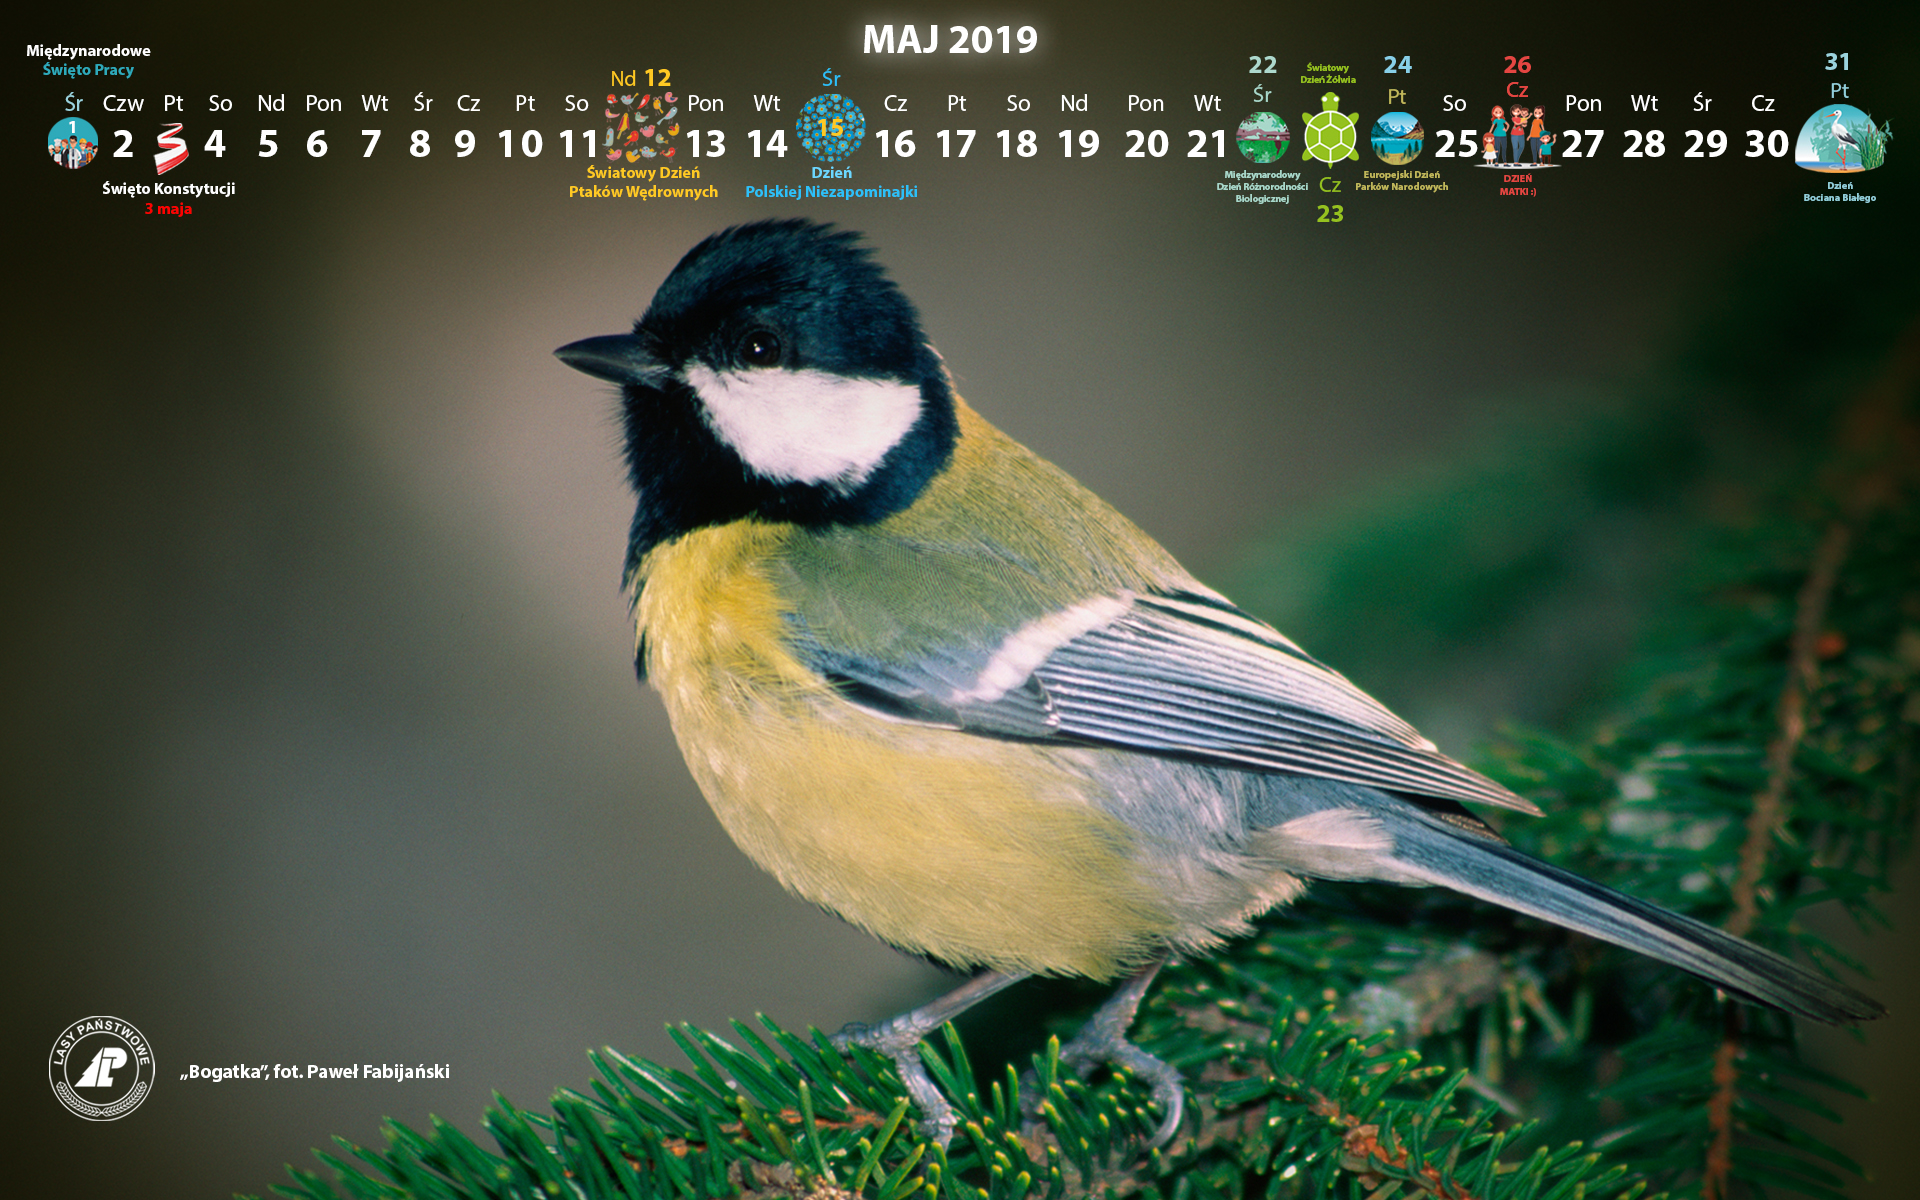 Kalendarz_maj_2019_1920x1200[1].jpg